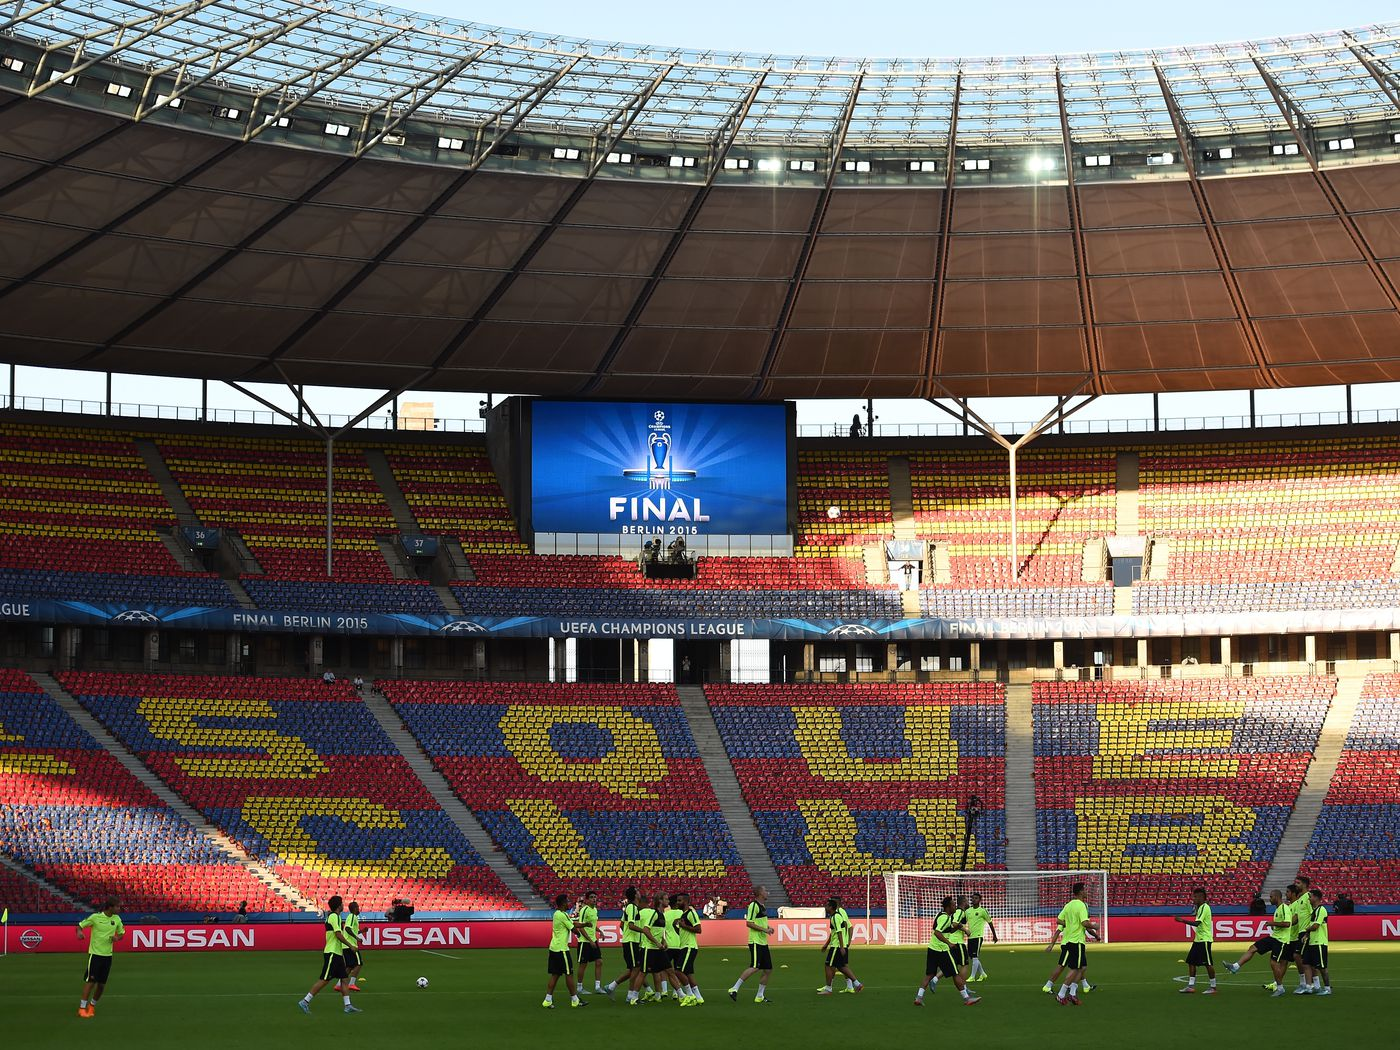 14+ Uefa Champions League Final 2015